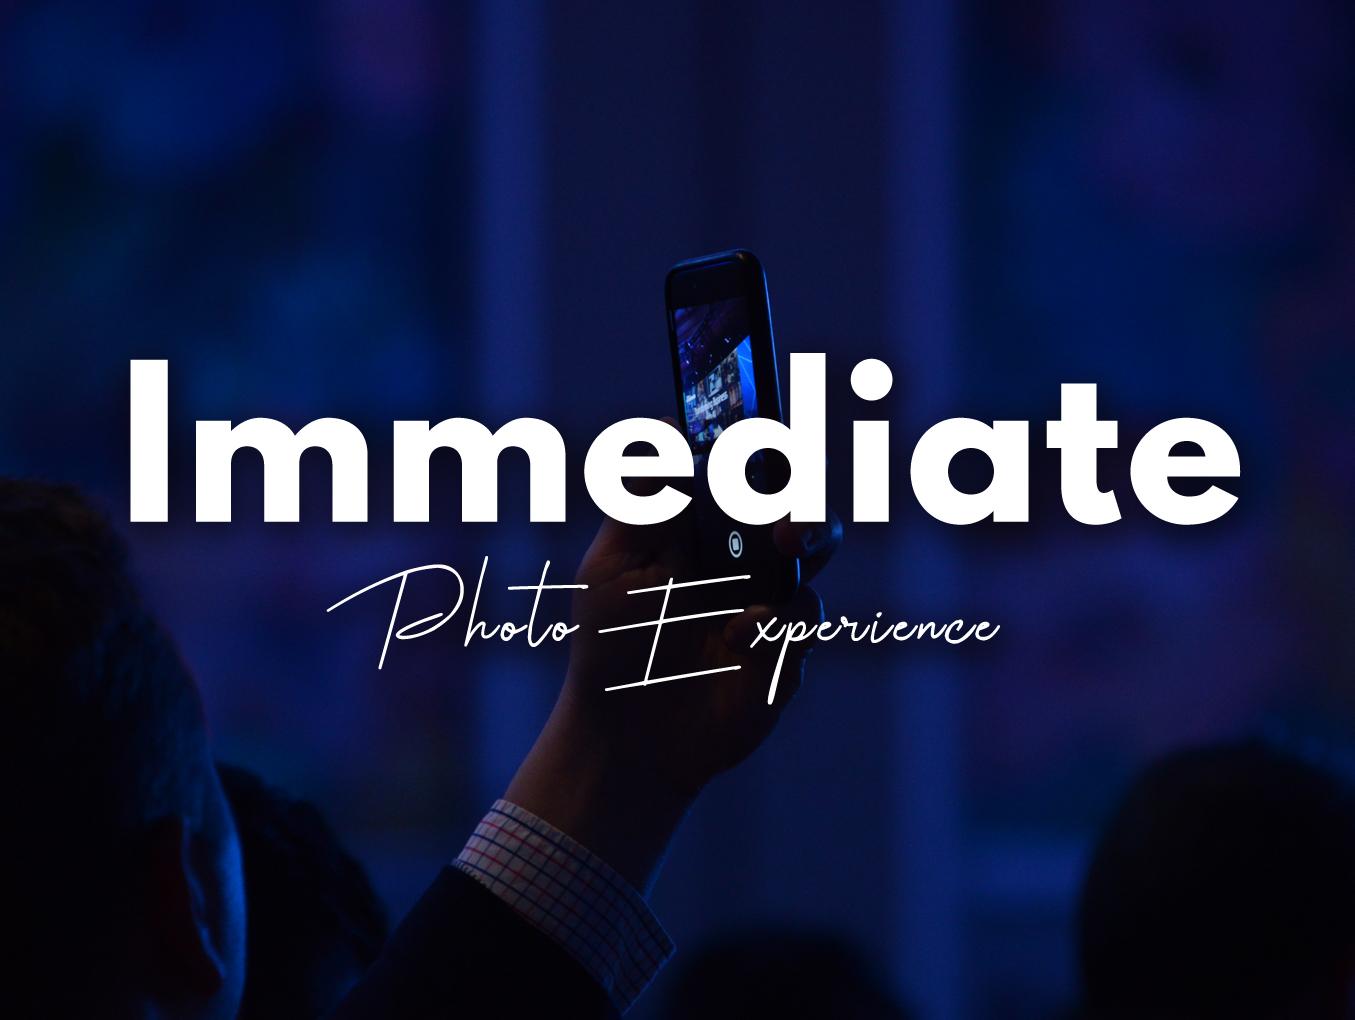 Immediate Photo Experience